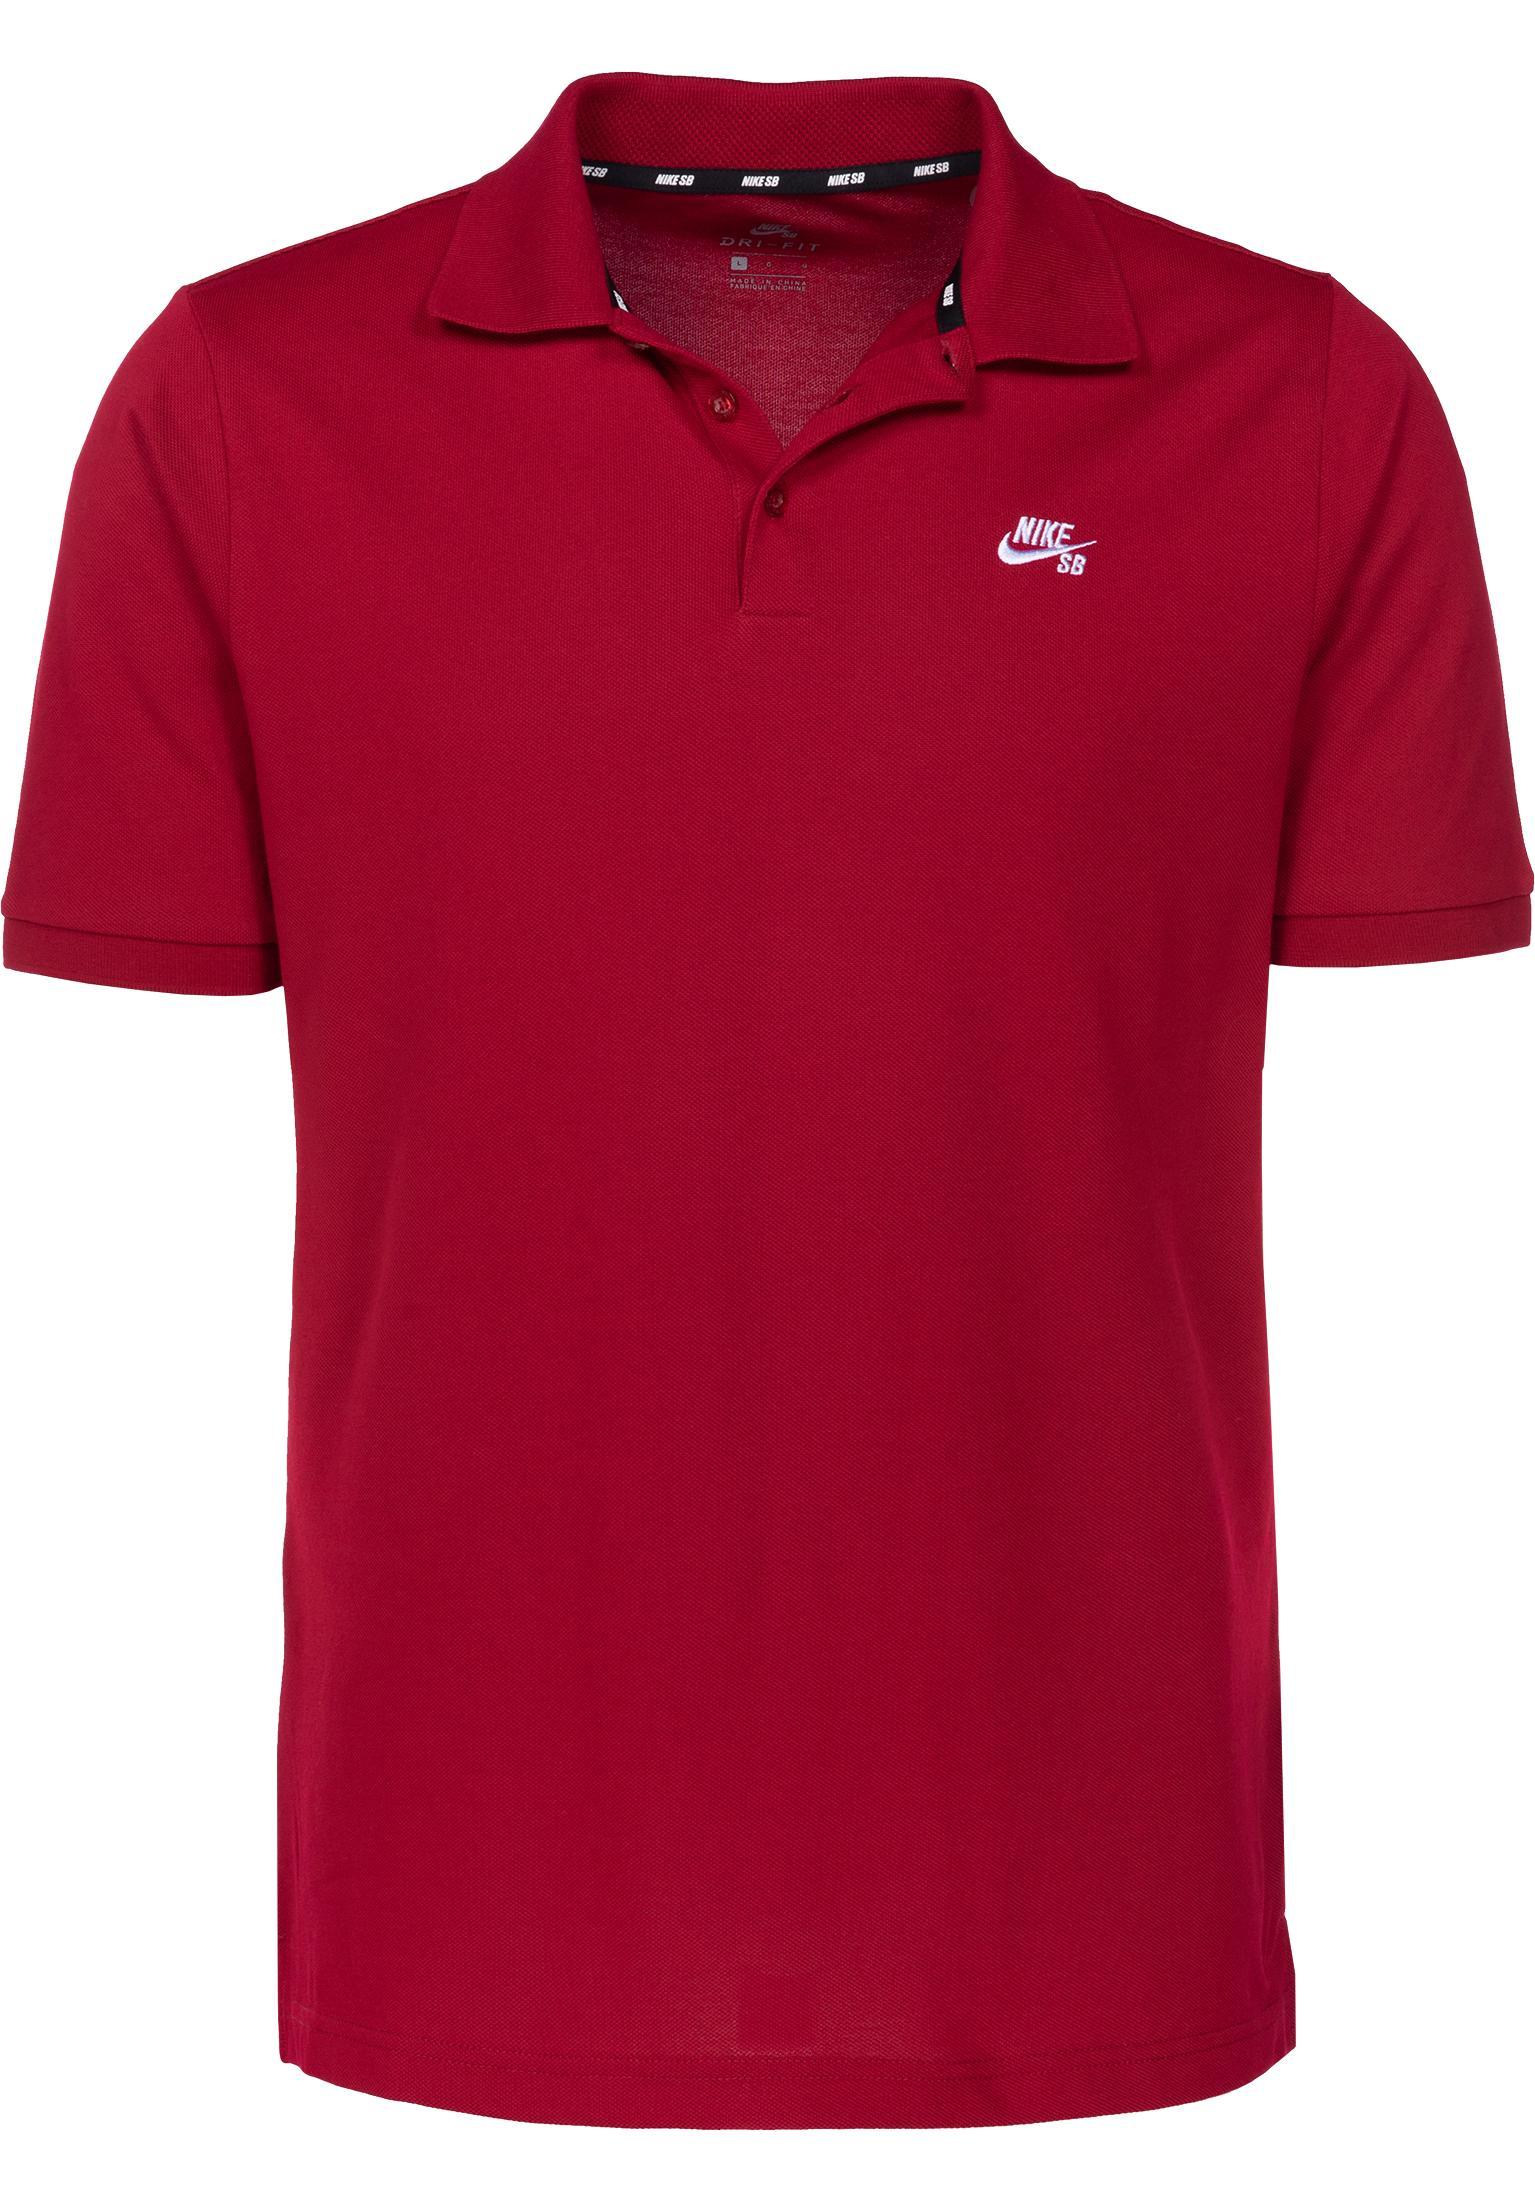 DFT Pique Nike SB Polo Shirts in redcrush-white for Men  8dfa5c5cf1d89